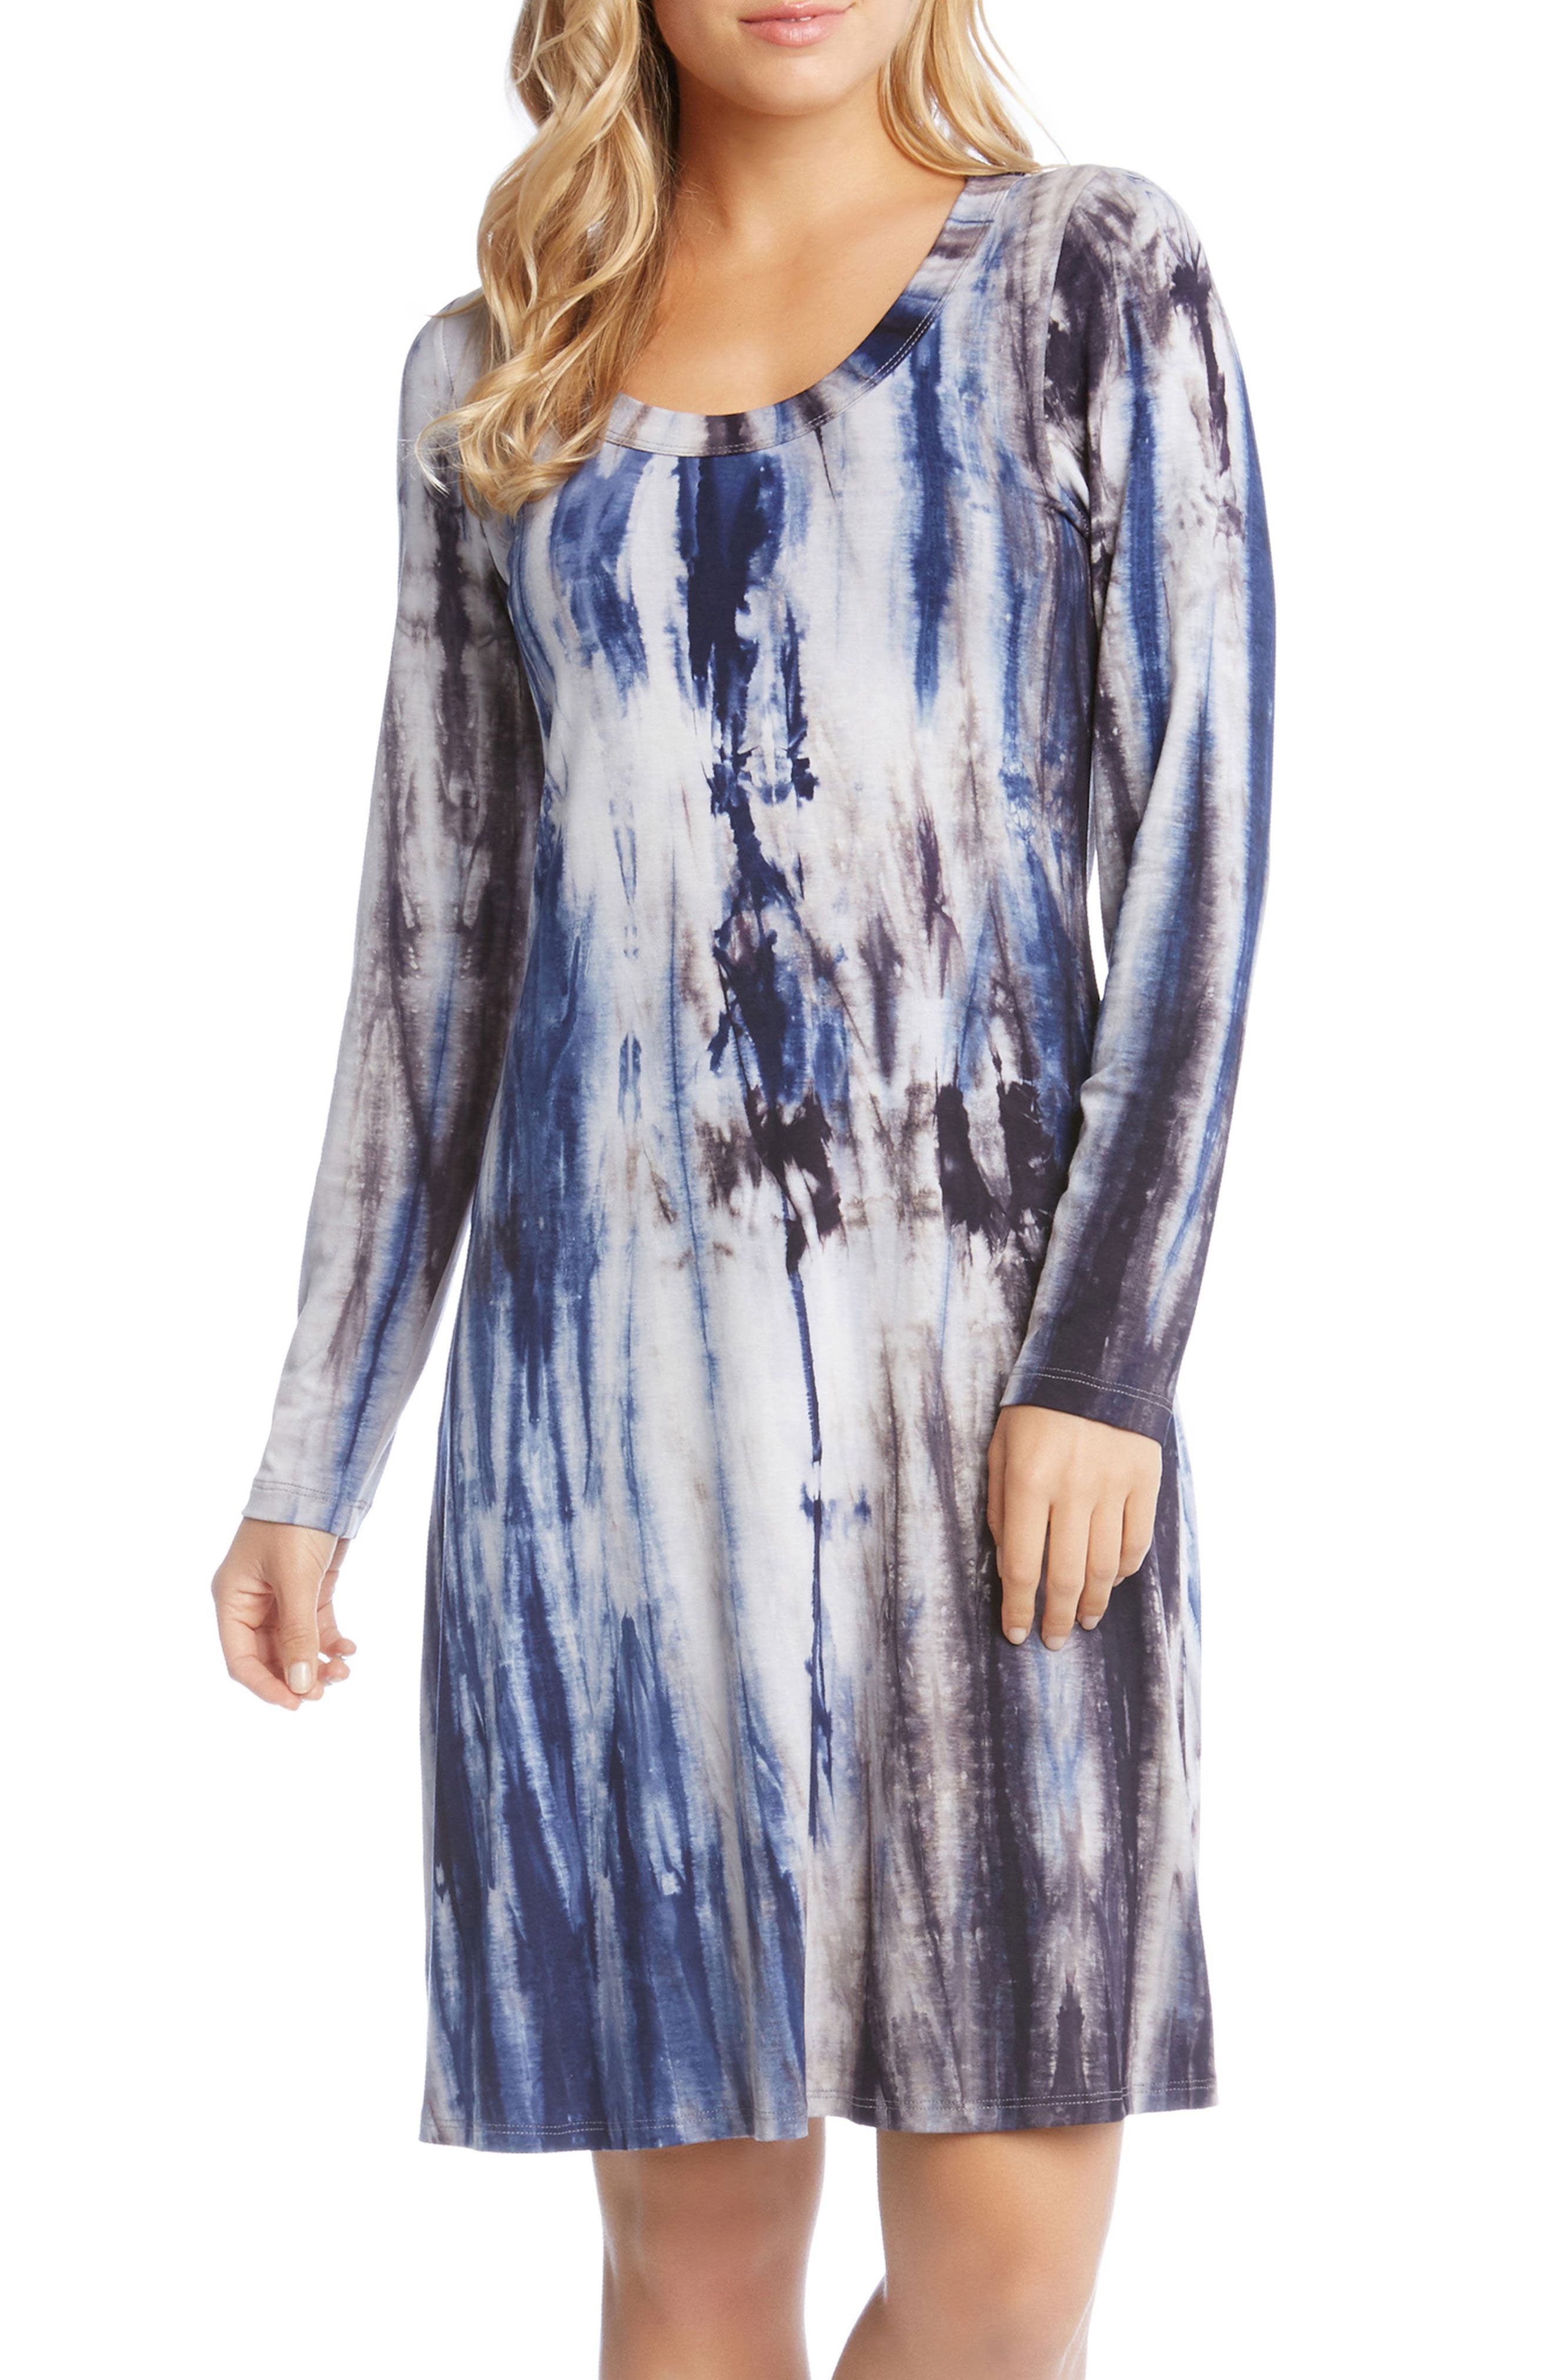 Scooped Neck A-Line Dress,                         Main,                         color, Tie-Dye